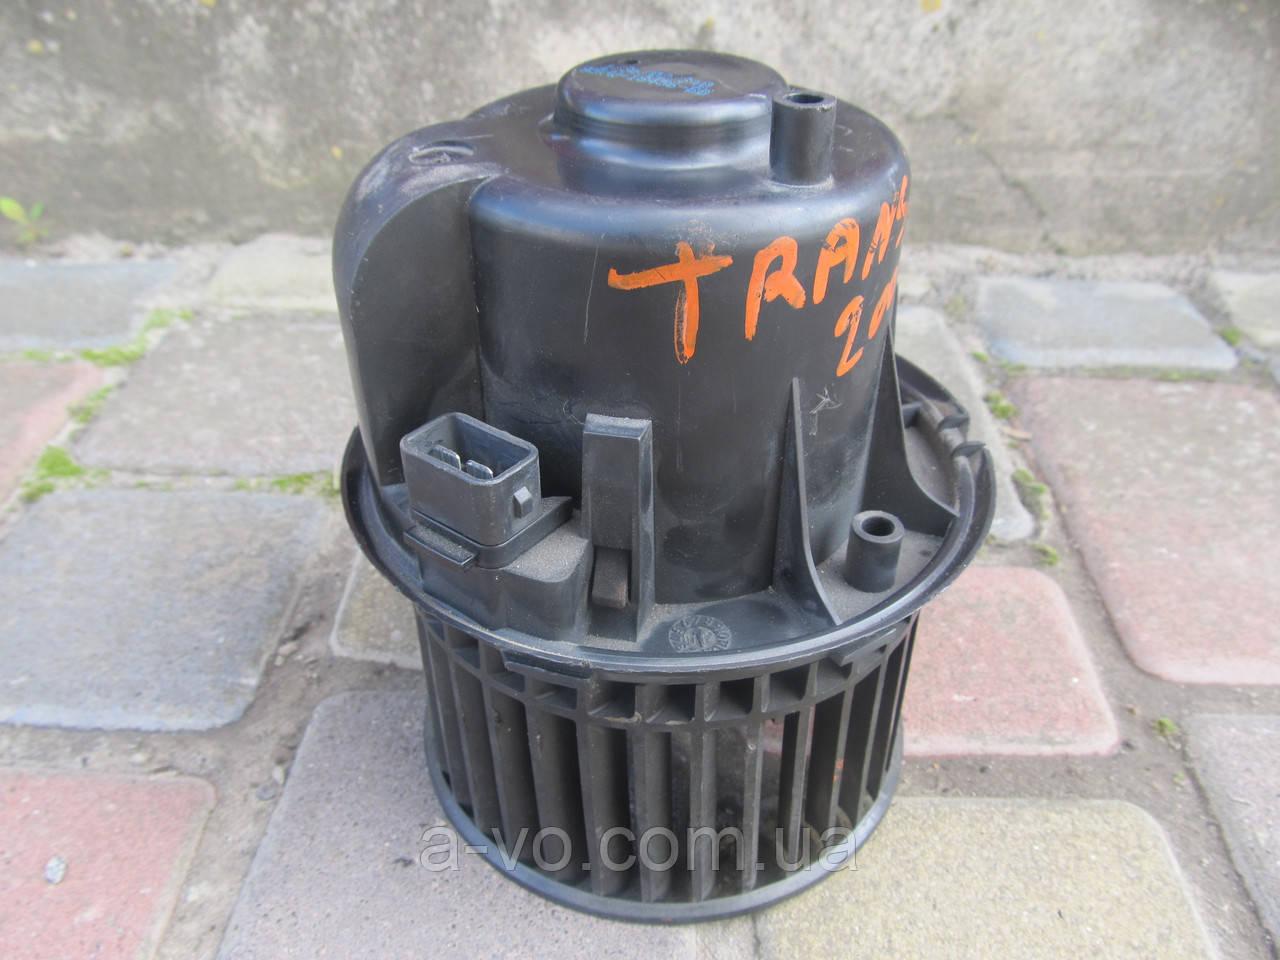 Вентилятор моторчик печки Ford Transit 6 YC1H-18456-CA, 95VW-18456-BB, 6C1H-18456-BA, 7188531